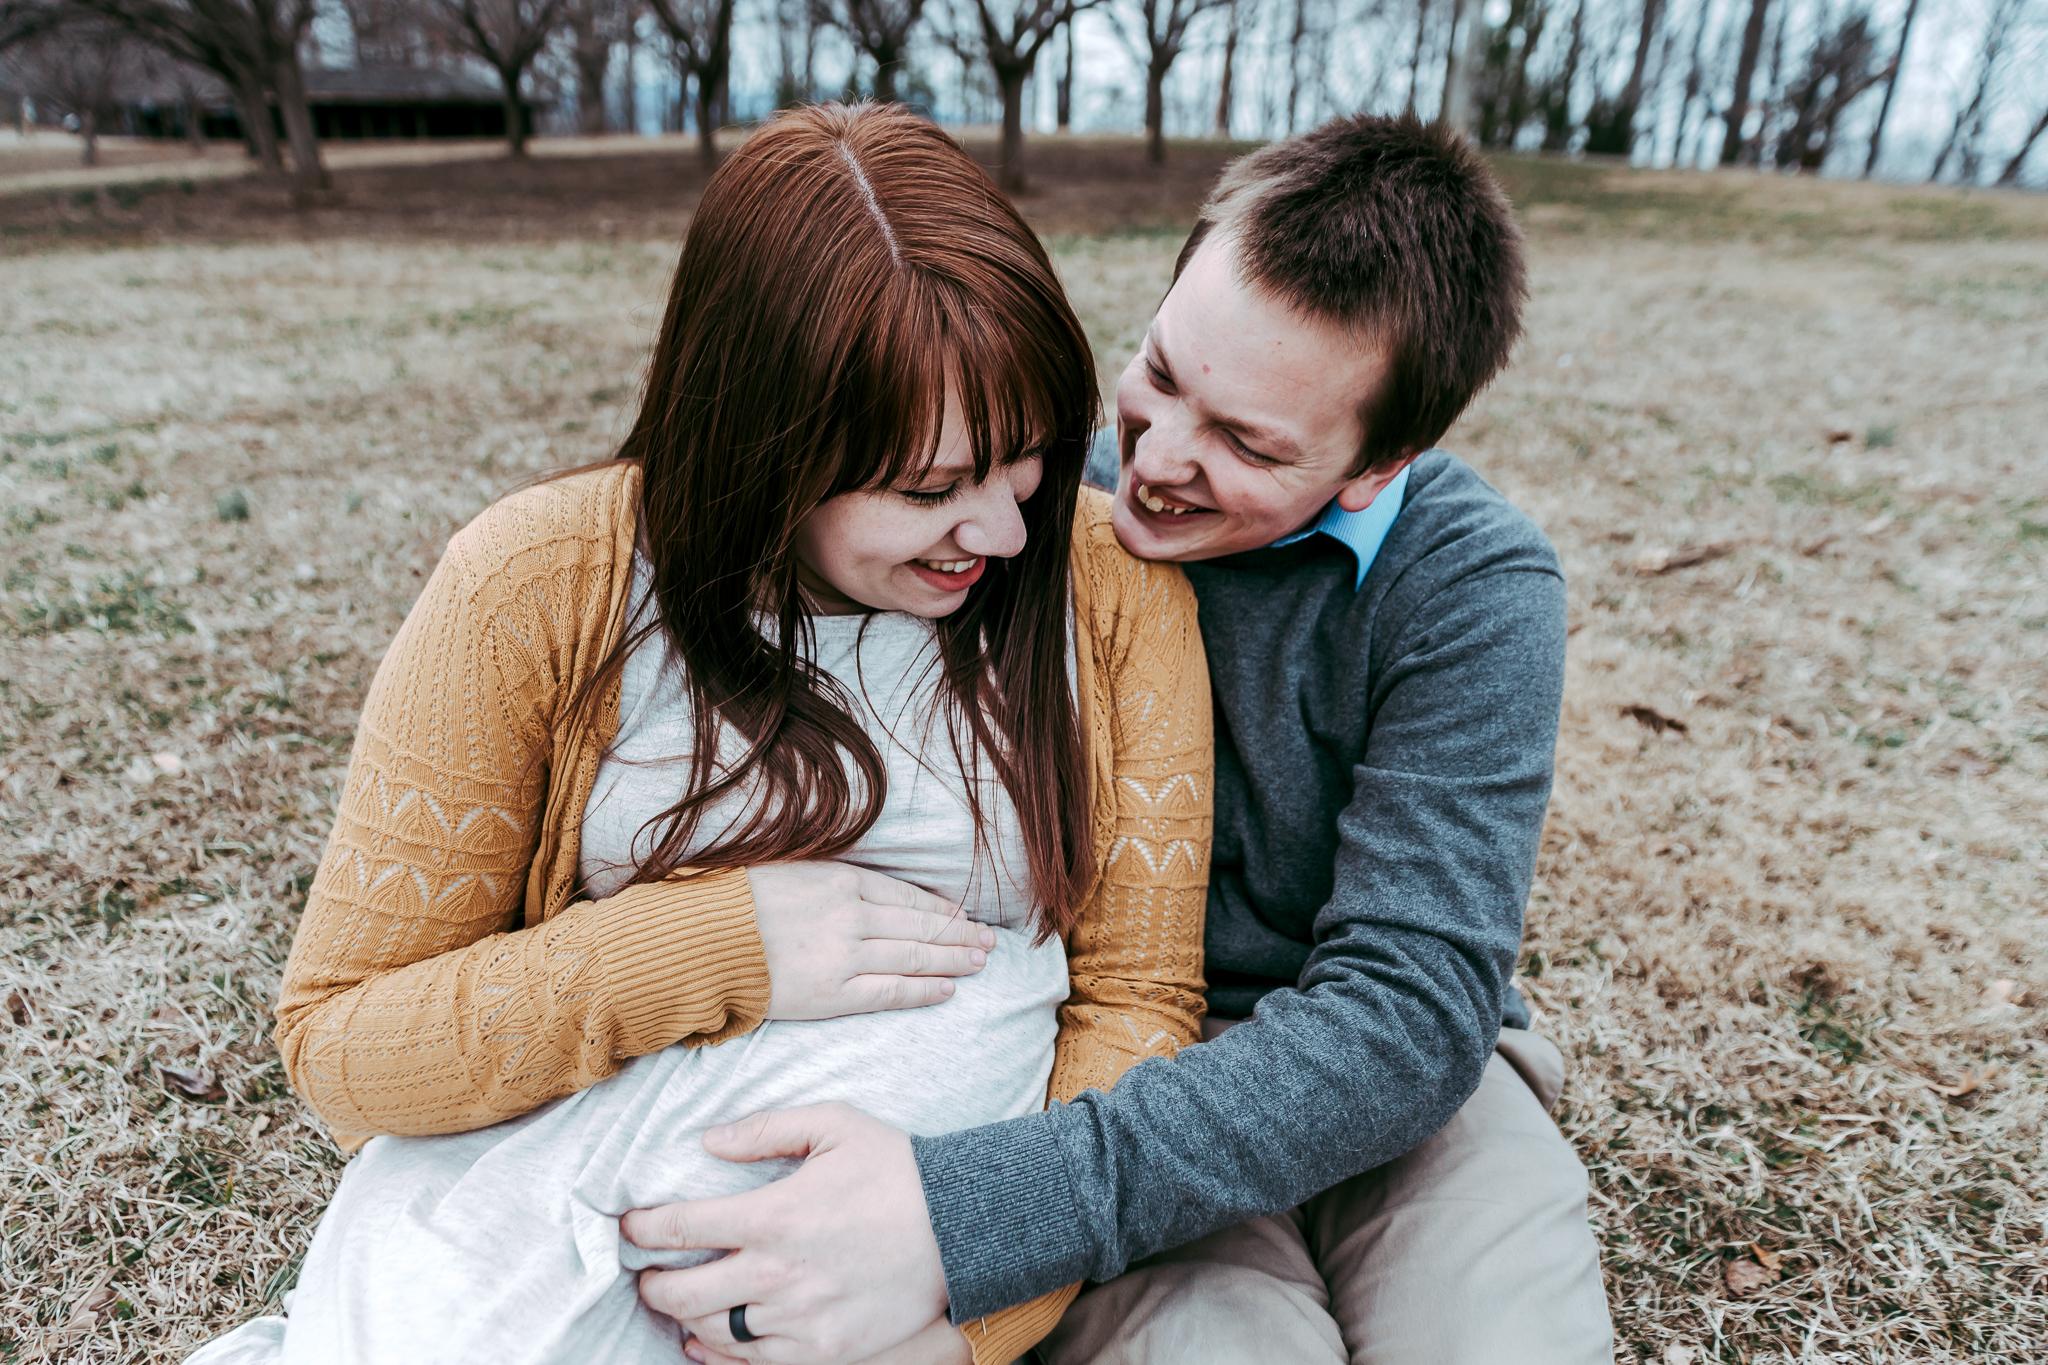 Photo by Christi Stafford Photography {www.christistaffordphoto.com}